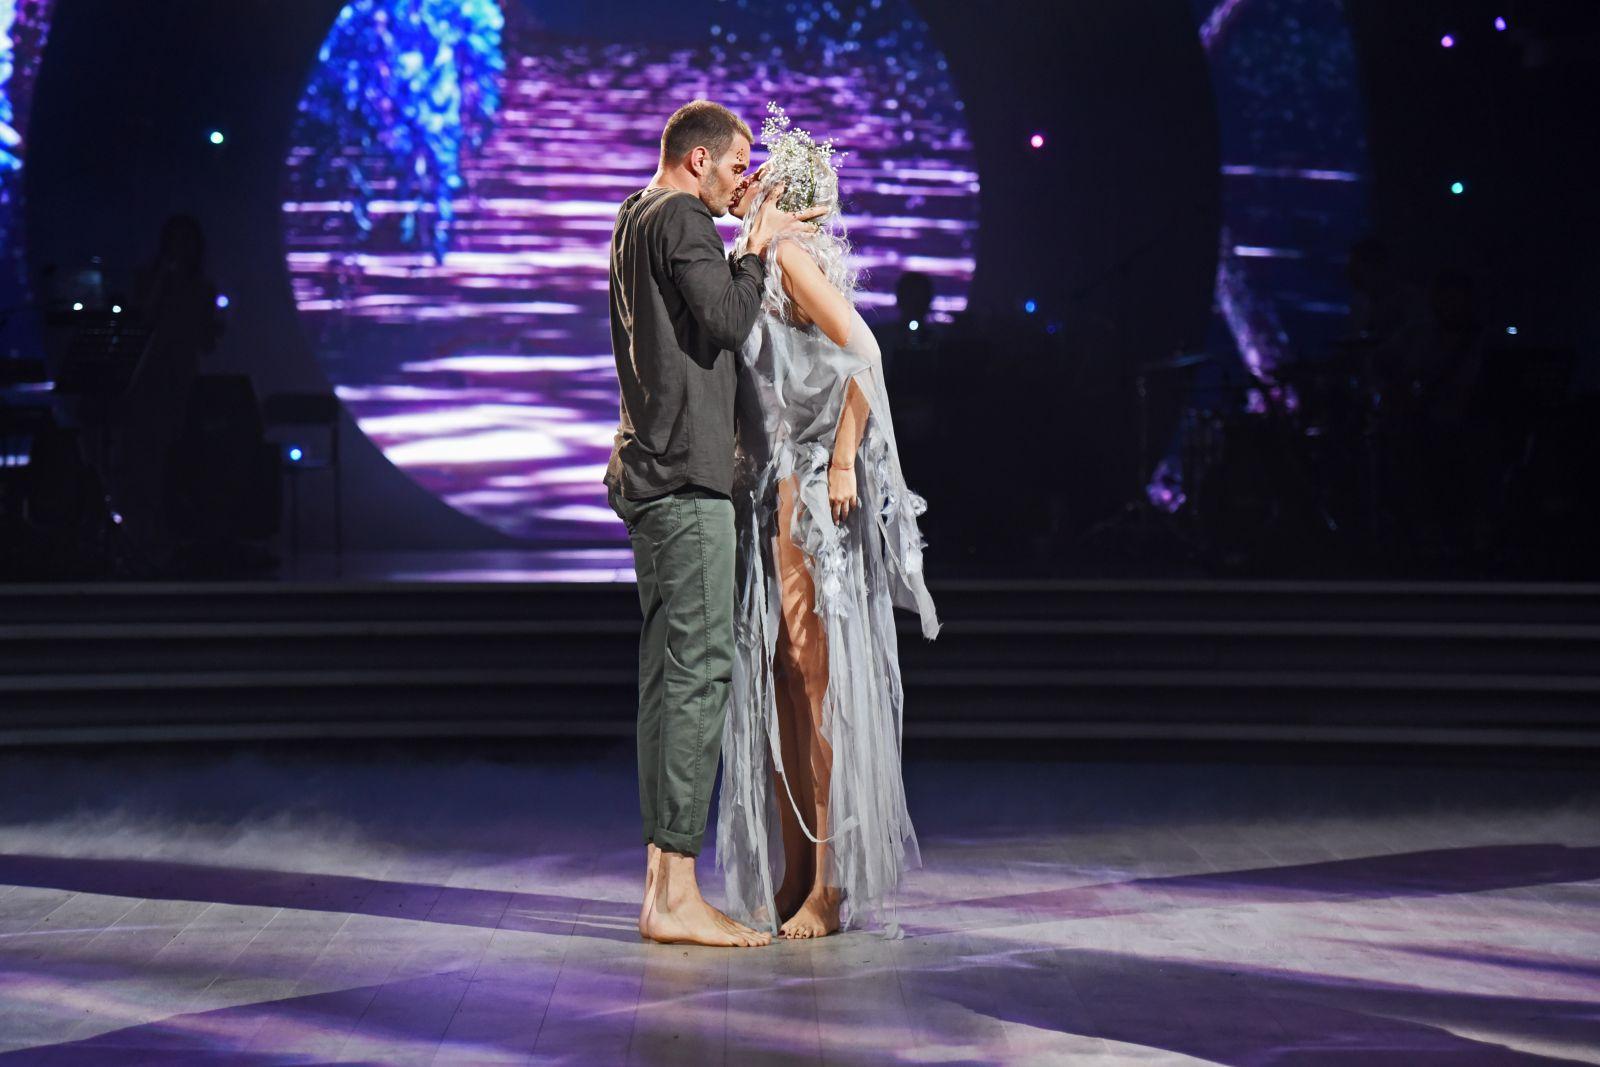 Оля Полякова об уходе из Танців з зірками: Надеюсь, без меня это шоу не станет скучным